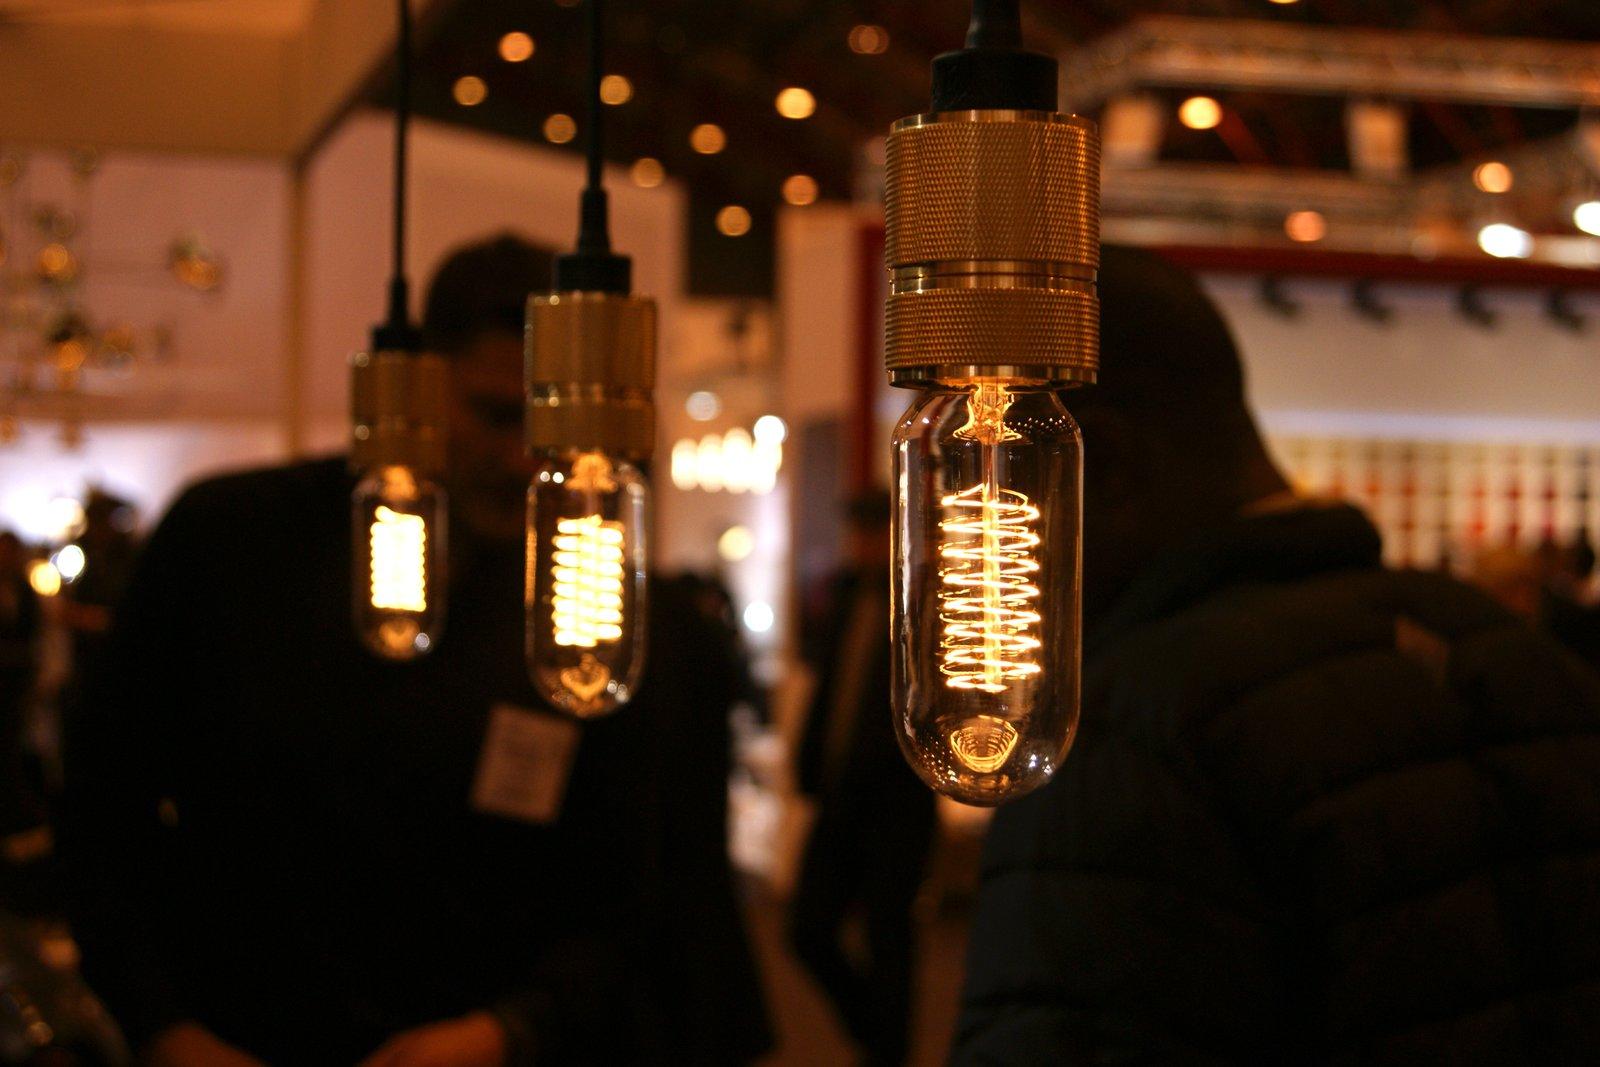 #lighting #modern #moderndesign #design #interior #buster+punch #filament #edison #bulb #pendantlamp #londondesignfestival #2013 #trends  #teardrops   60+ Modern Lighting Solutions by Dwell from Light